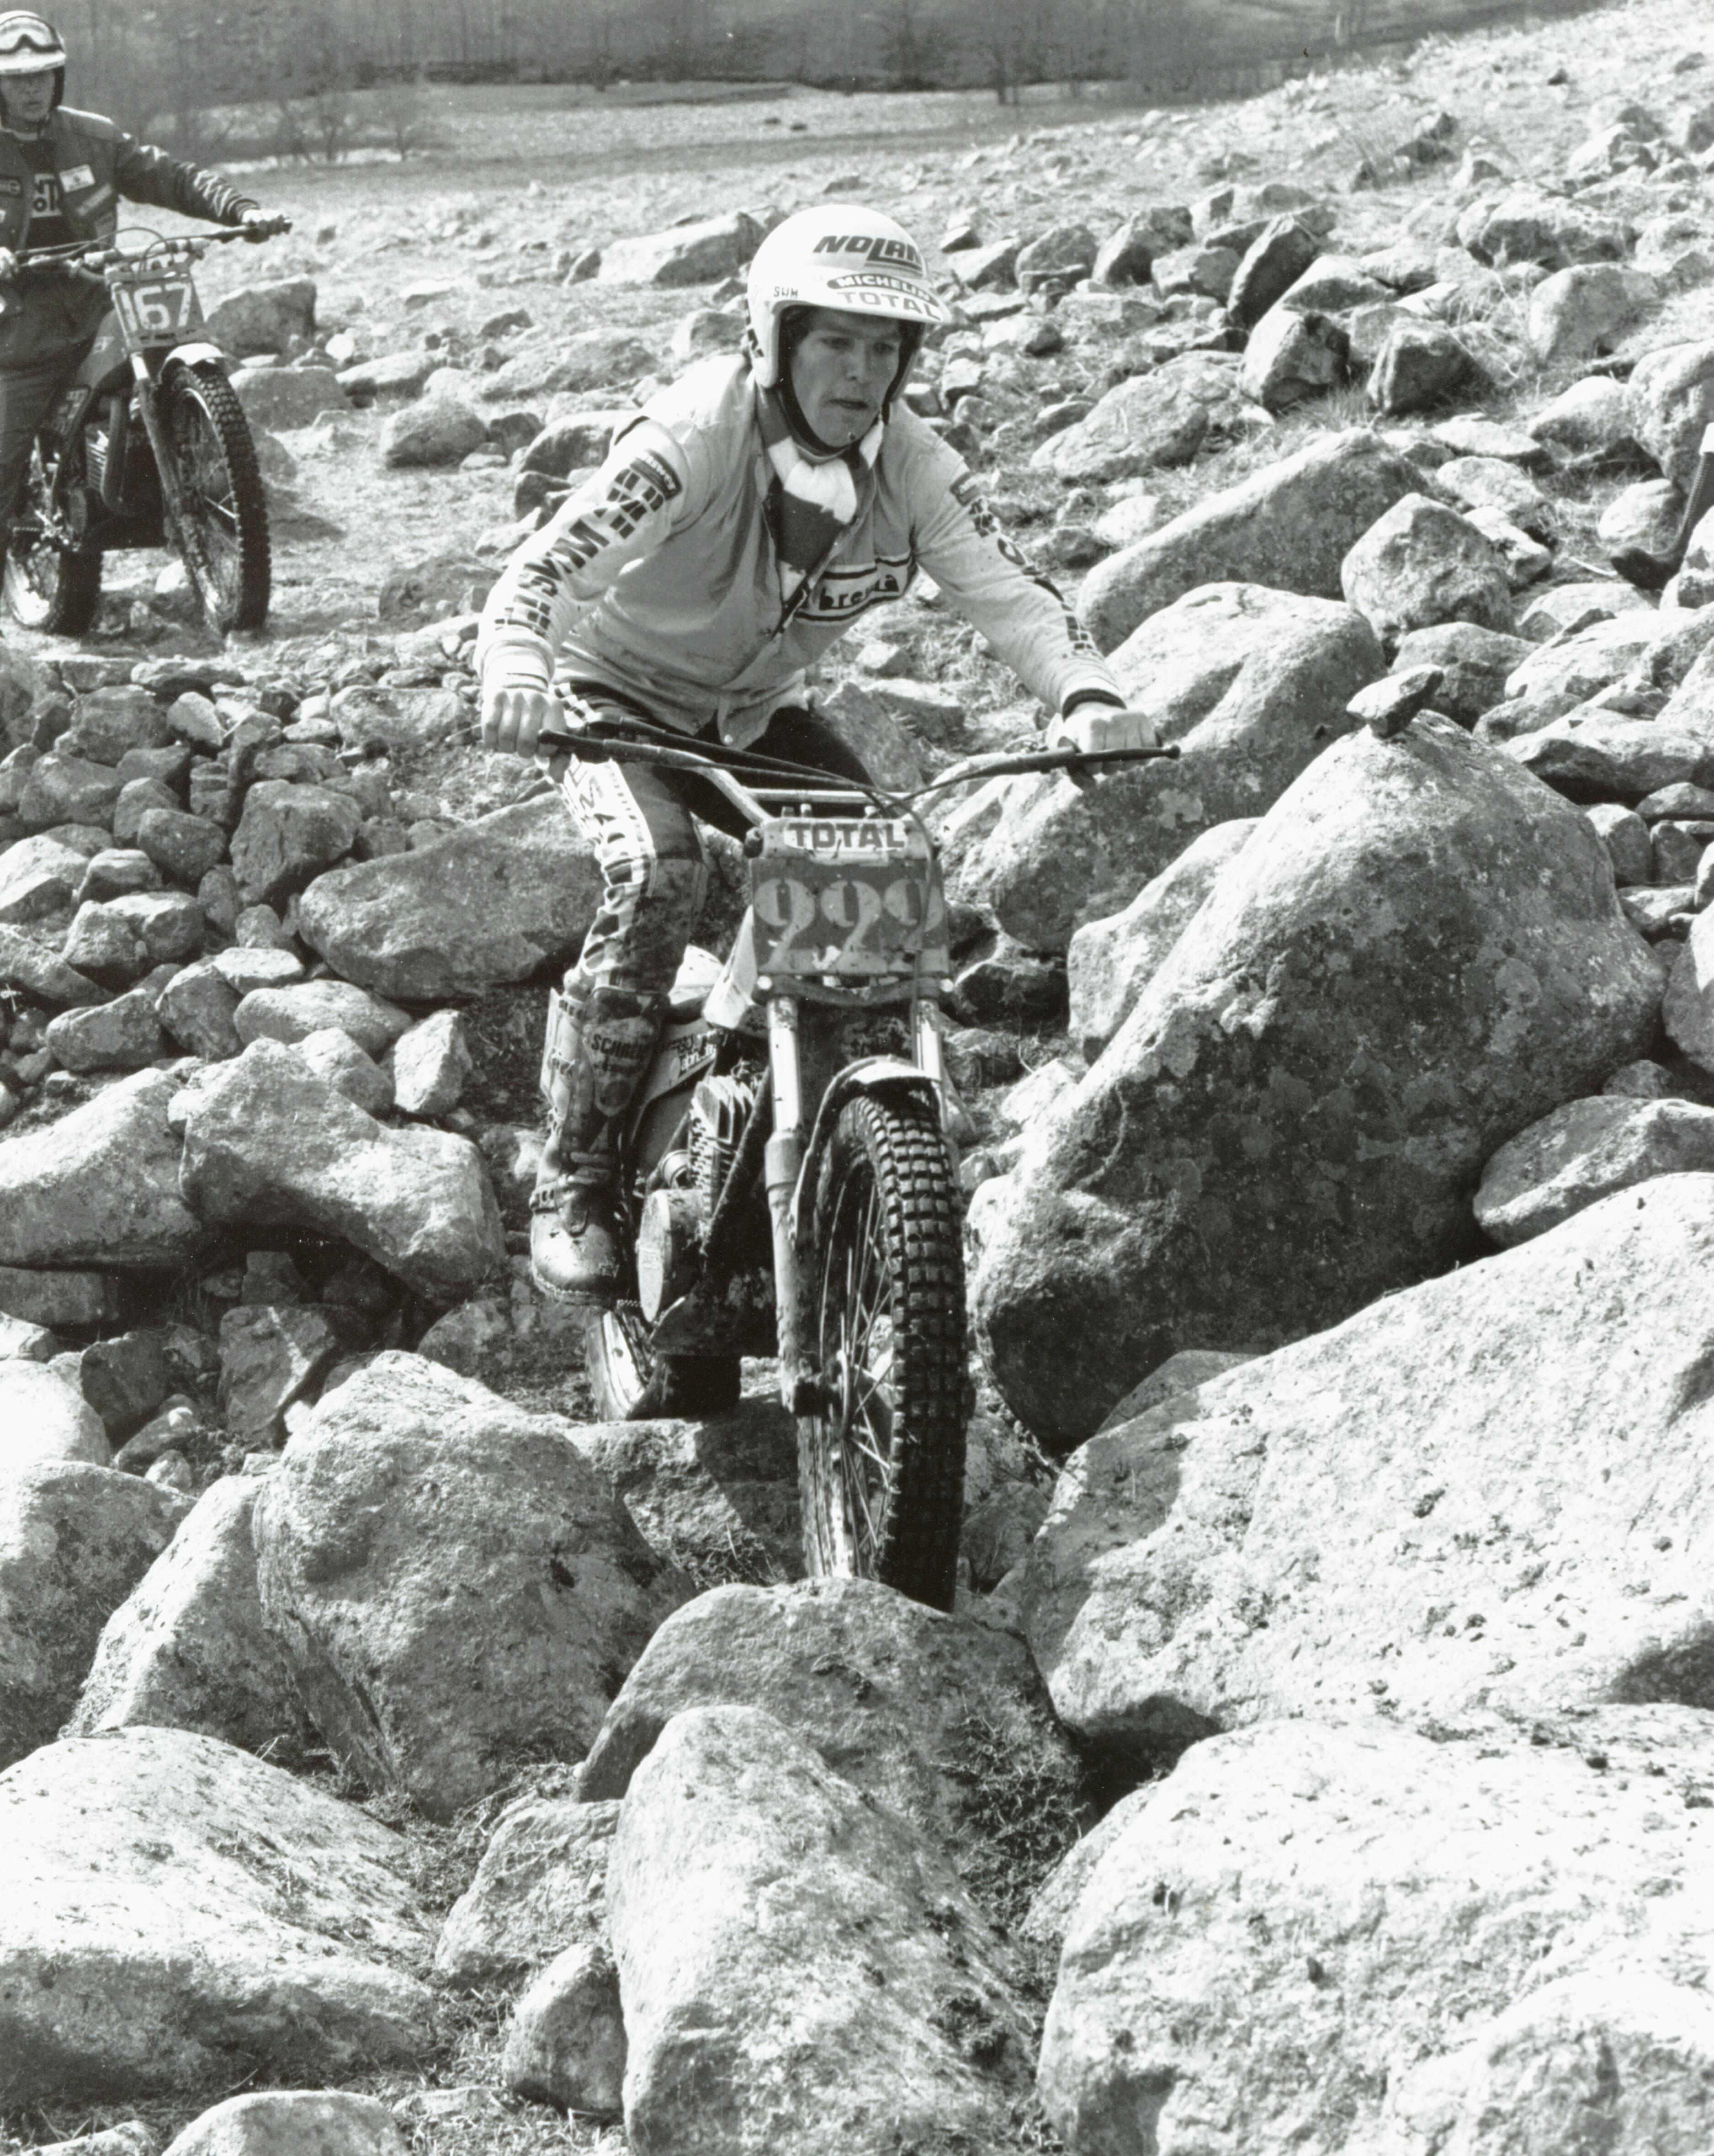 Bernie Schreiber - SWM - 1983 SSDT - JH